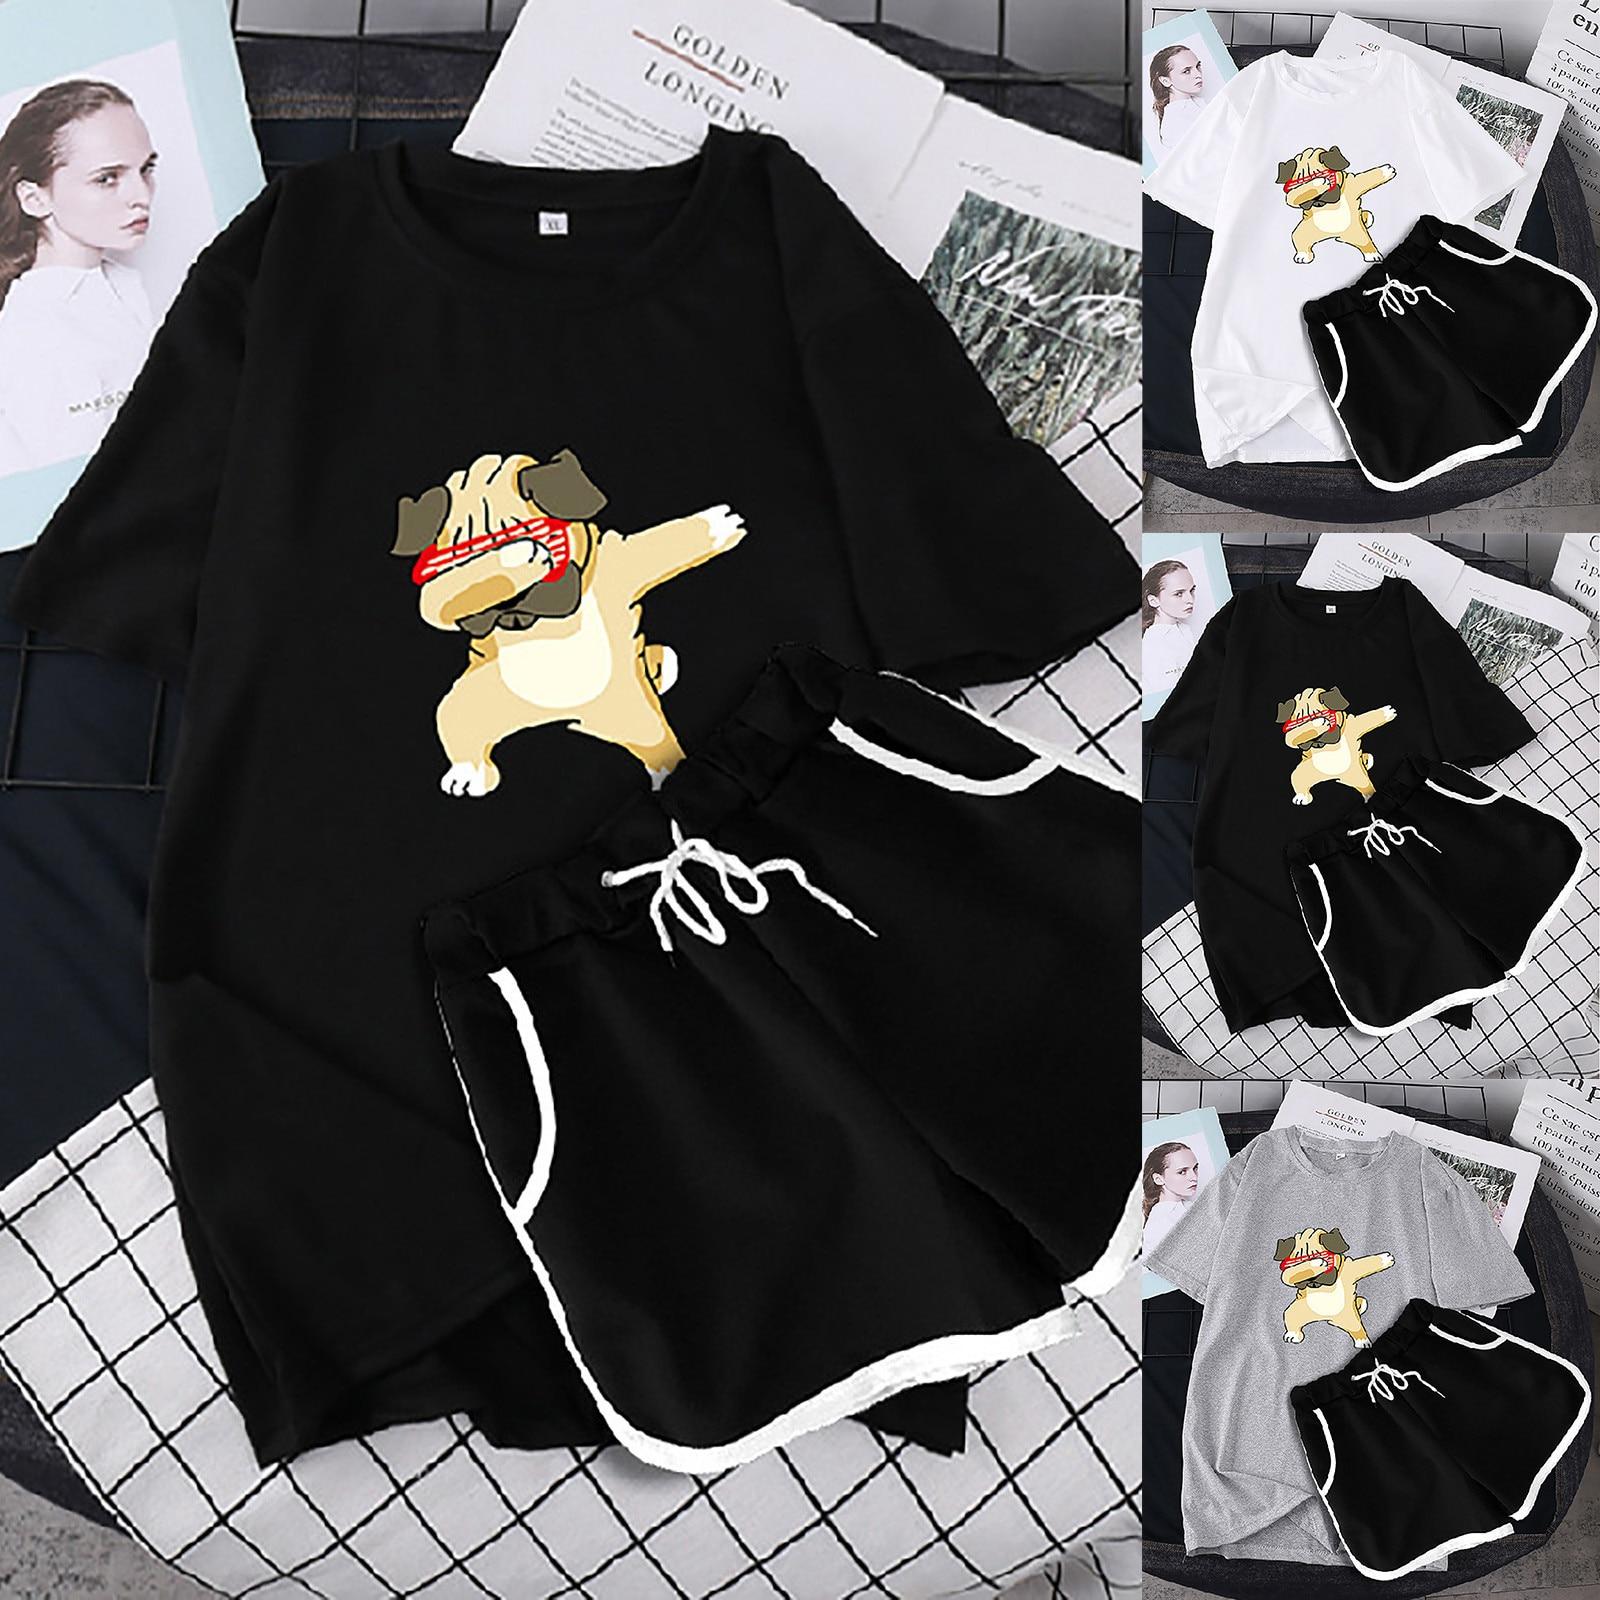 ISHOWTIENDA Women Two Piece Drop Sleeves Set Short Sleeve O-neck Paneled T Shirt Shorts Костюм Спортивный Женский Women Set